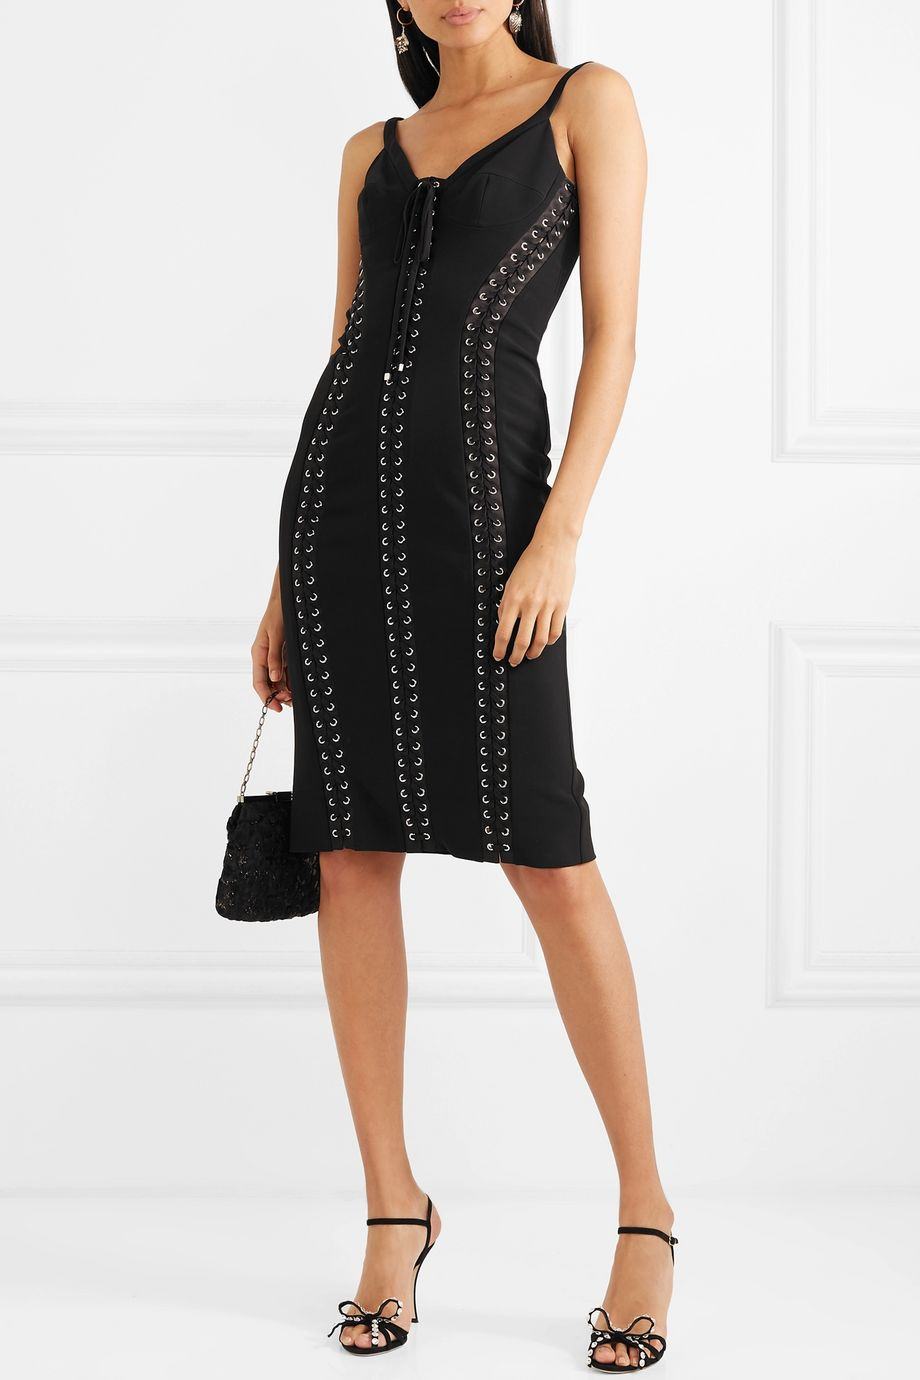 Dolce & Gabbana Lace-up satin-trimmed crepe midi dress